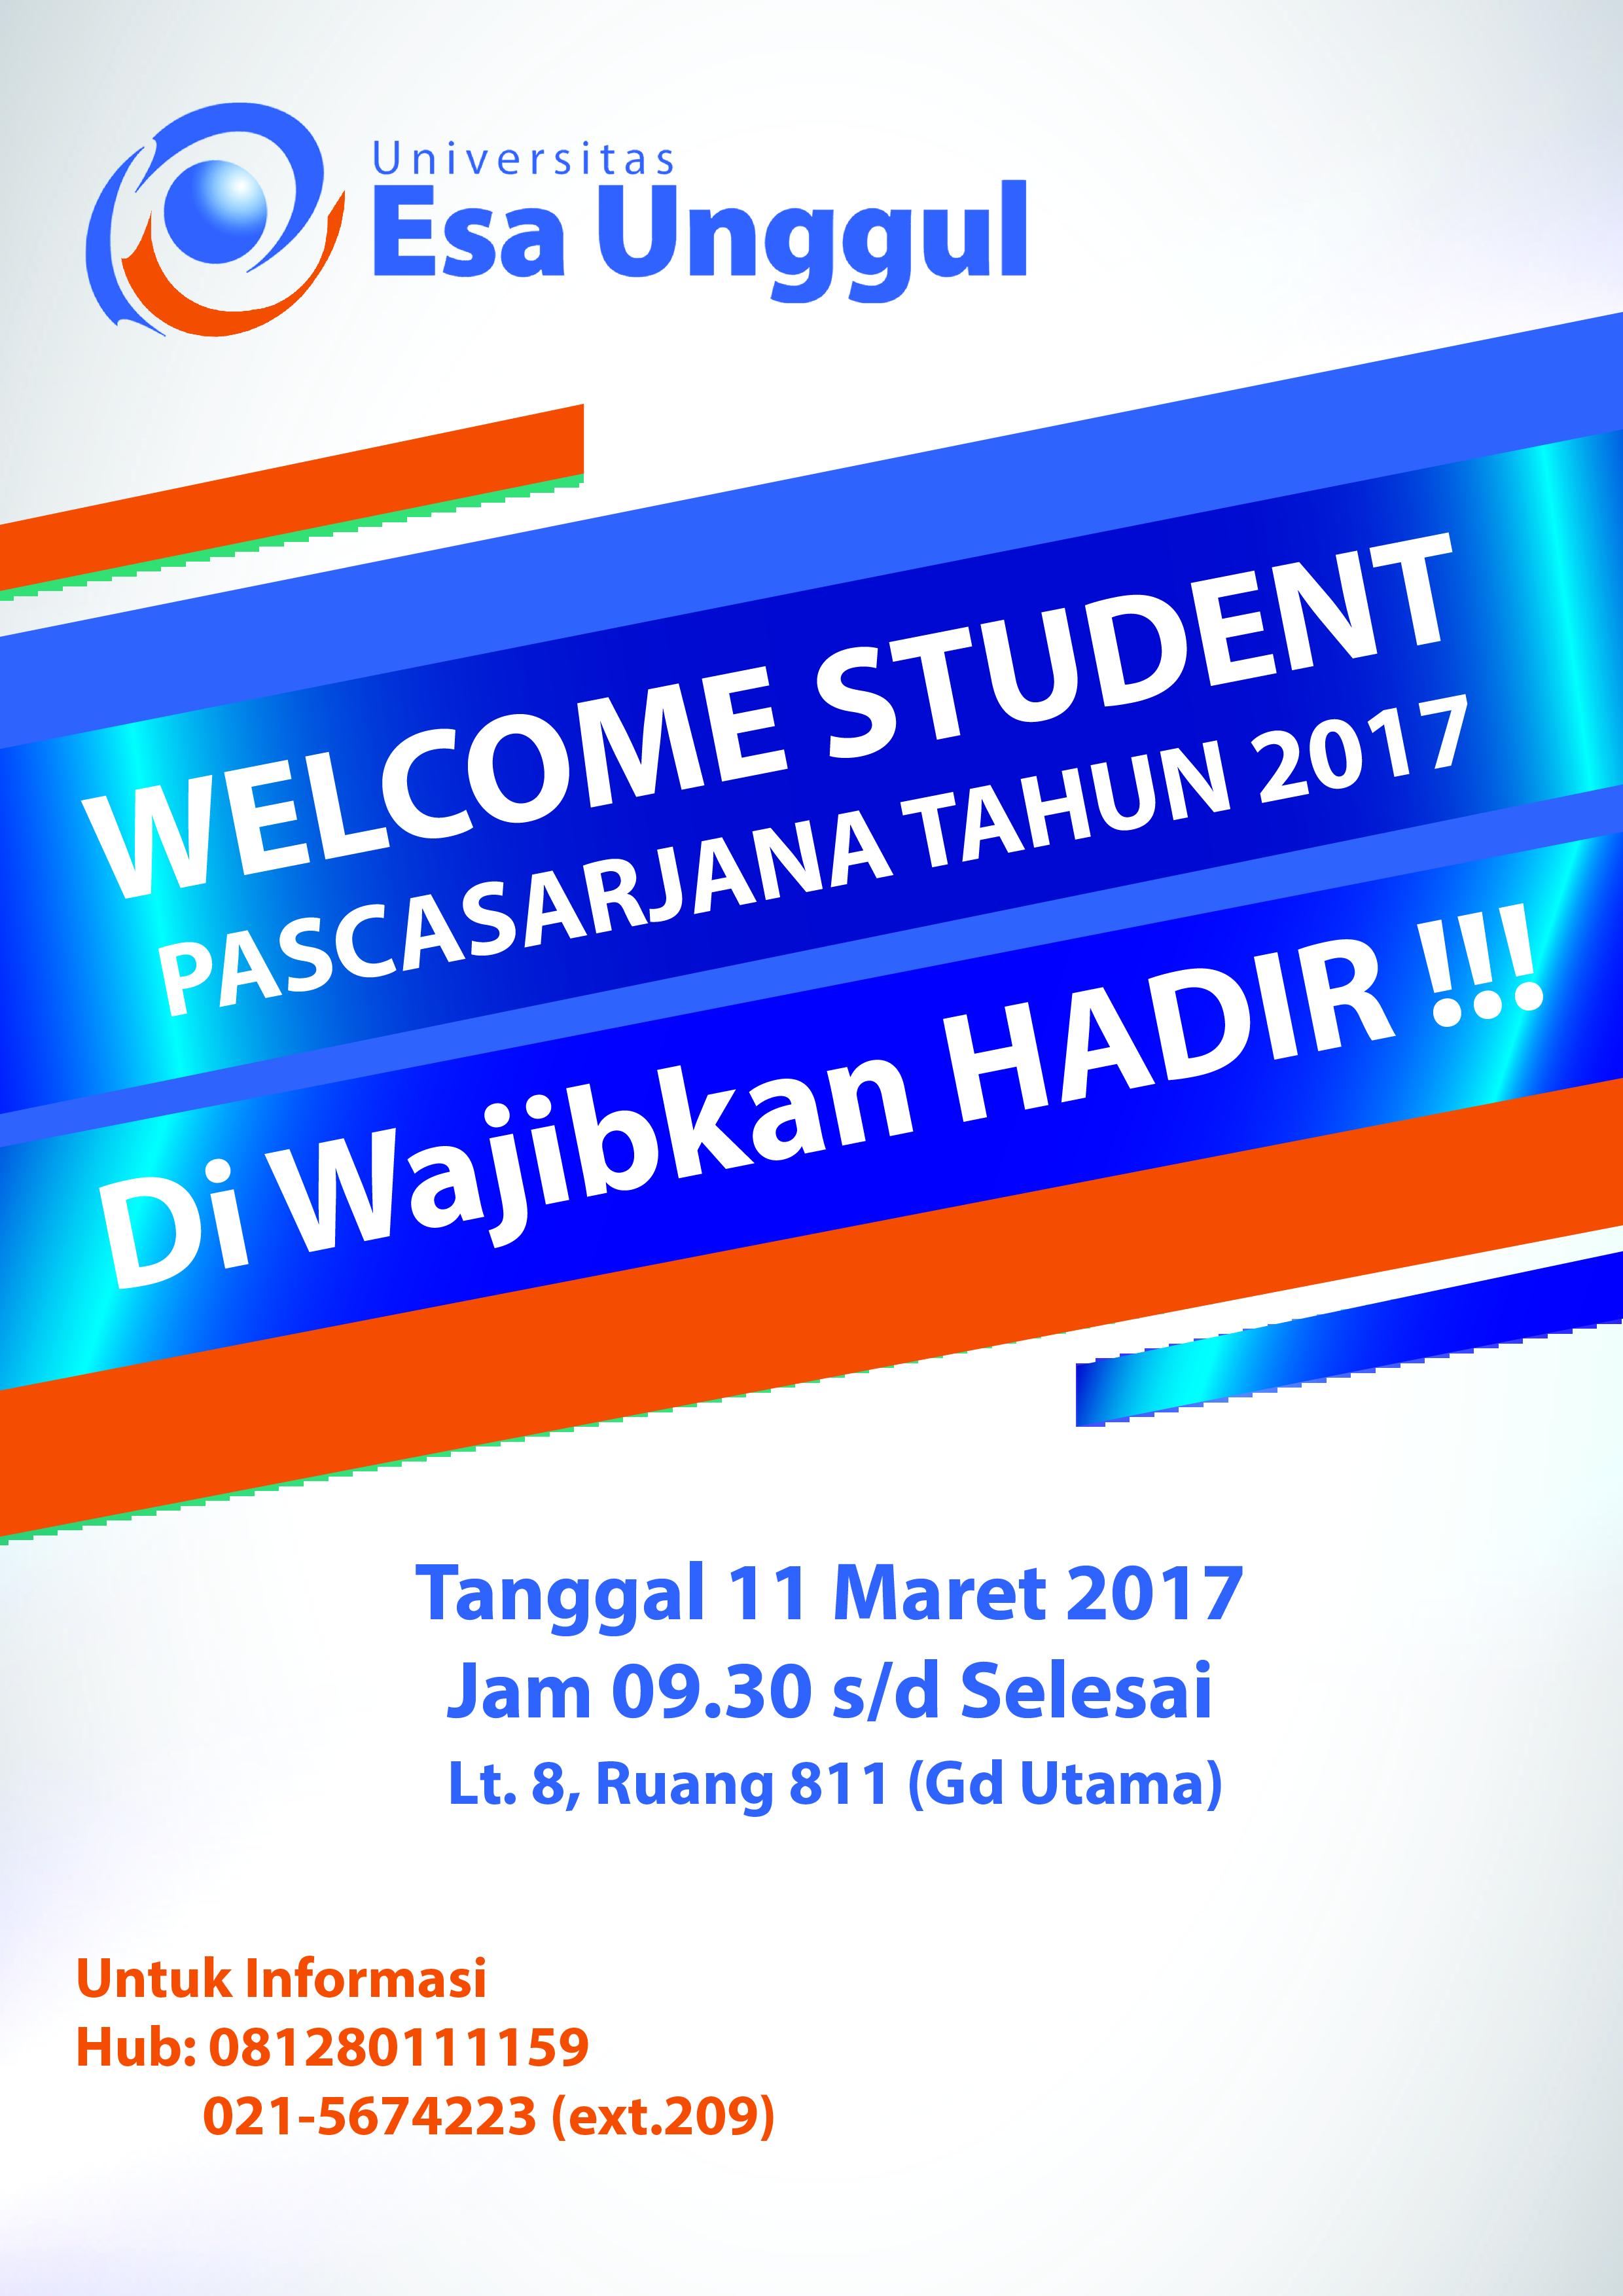 Welcome Student Program Pascasarjana 2017